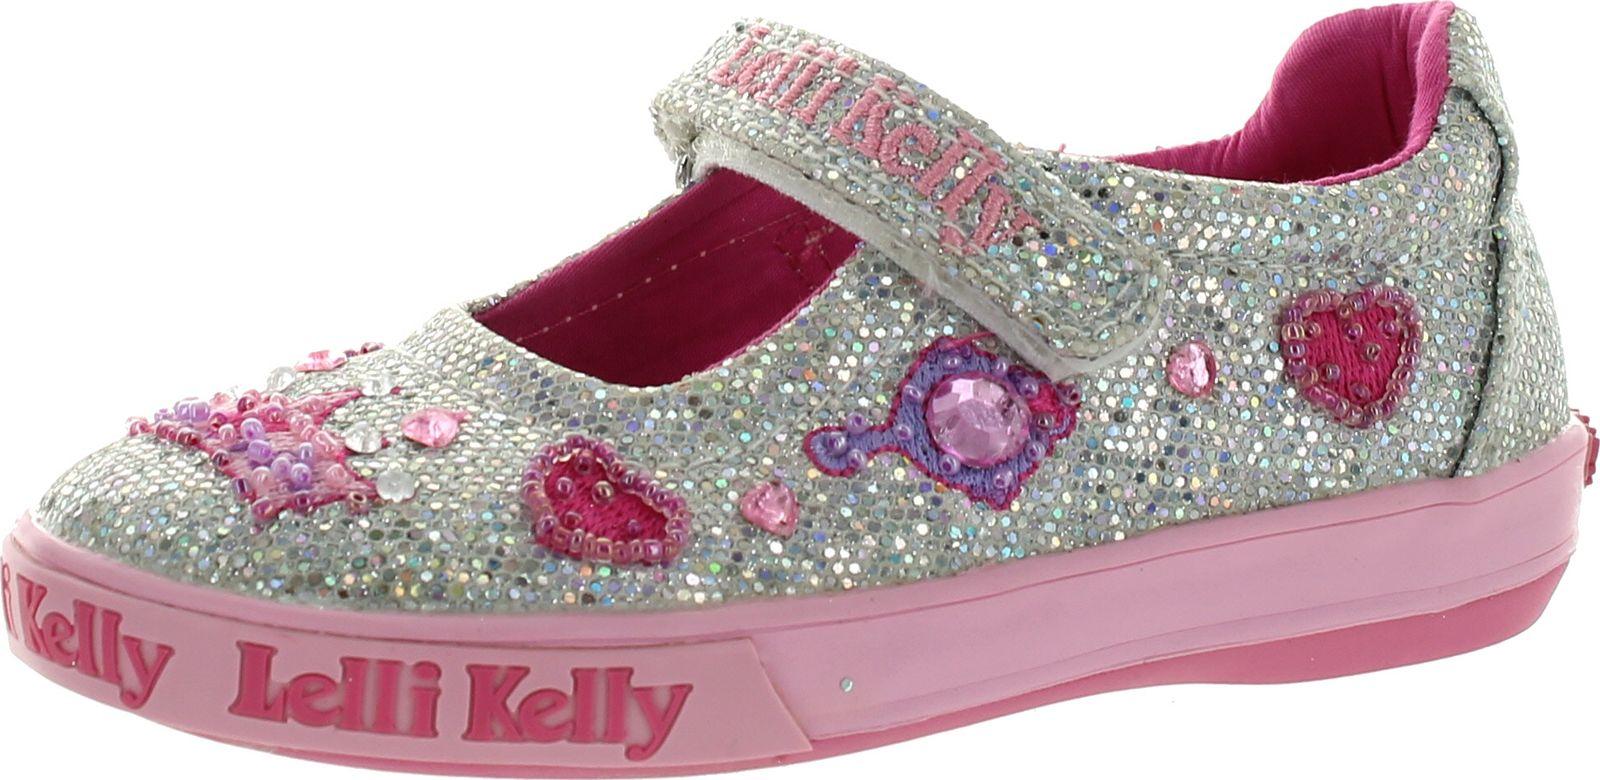 Buy Lelli Kelly Shoes Usa